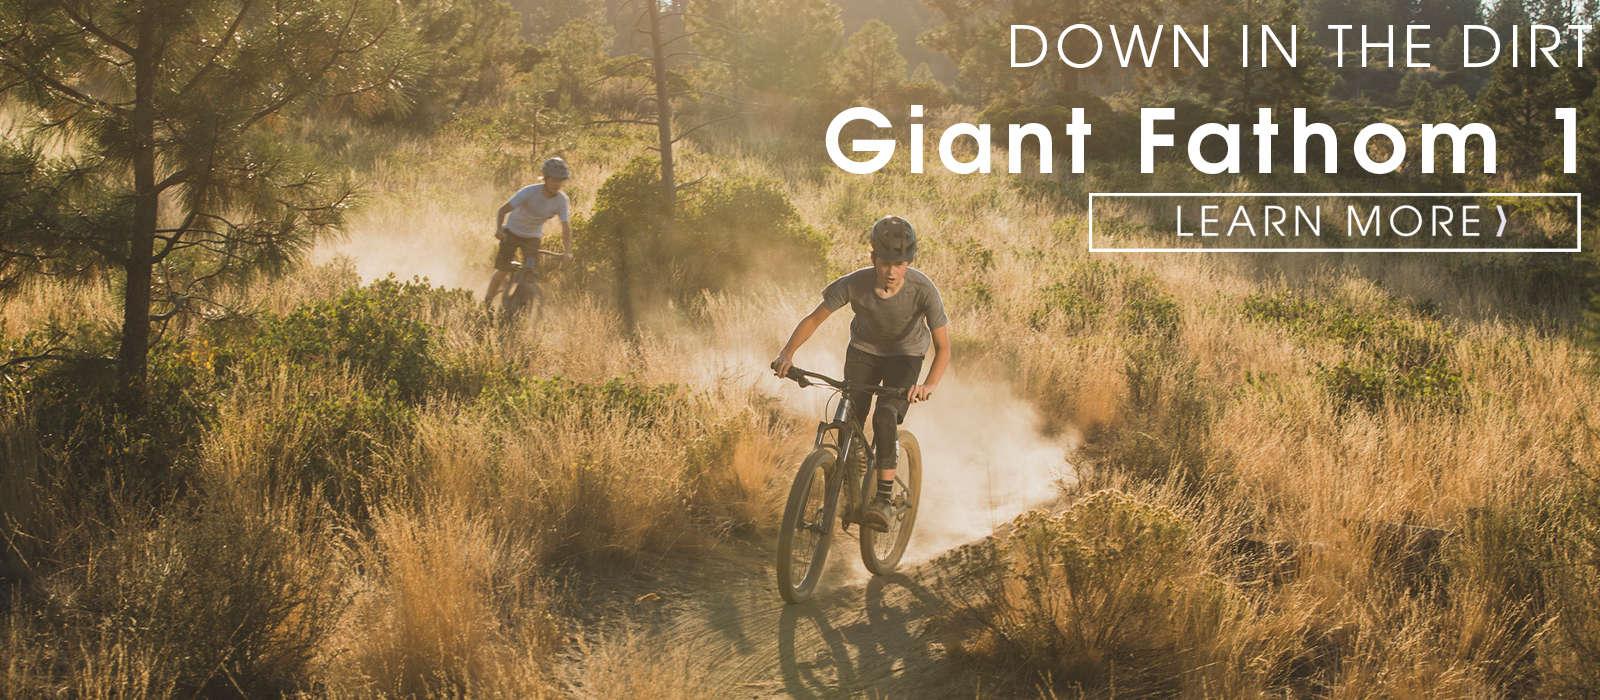 Giant Fathom